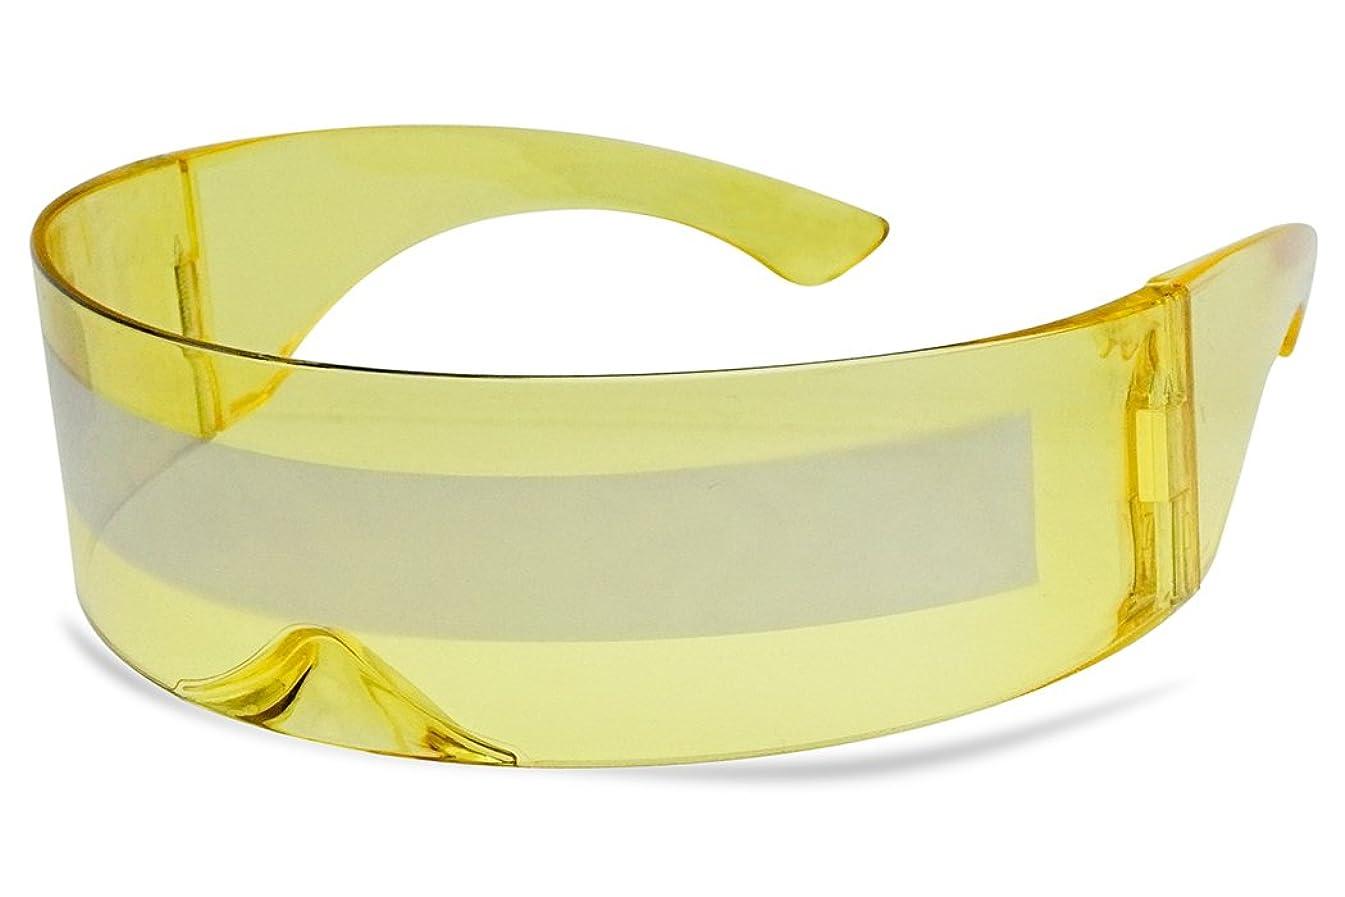 SunglassUP One Piece Futuristic Wrap Around Novelty Cyclops Robocop Sunglasses